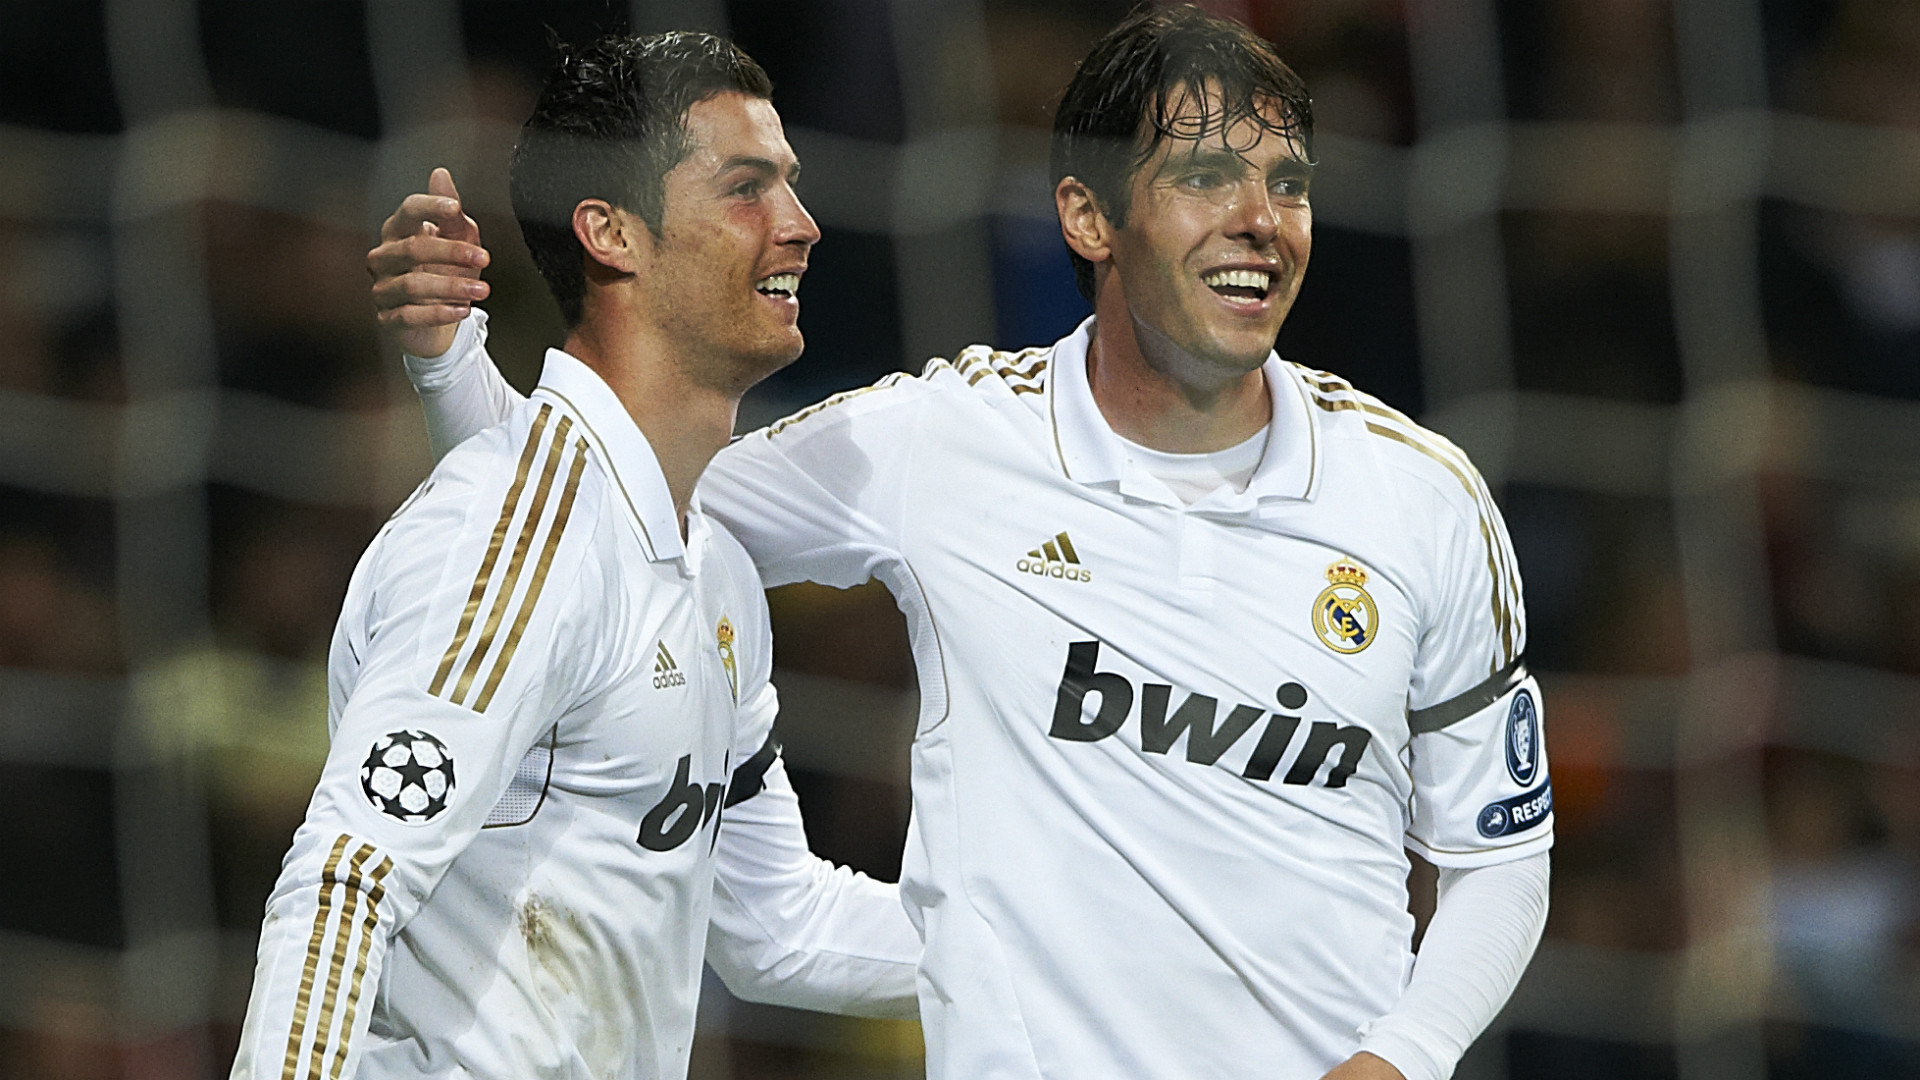 Marcelo minimiza resultados e exalta parte física do elenco do Real Madrid